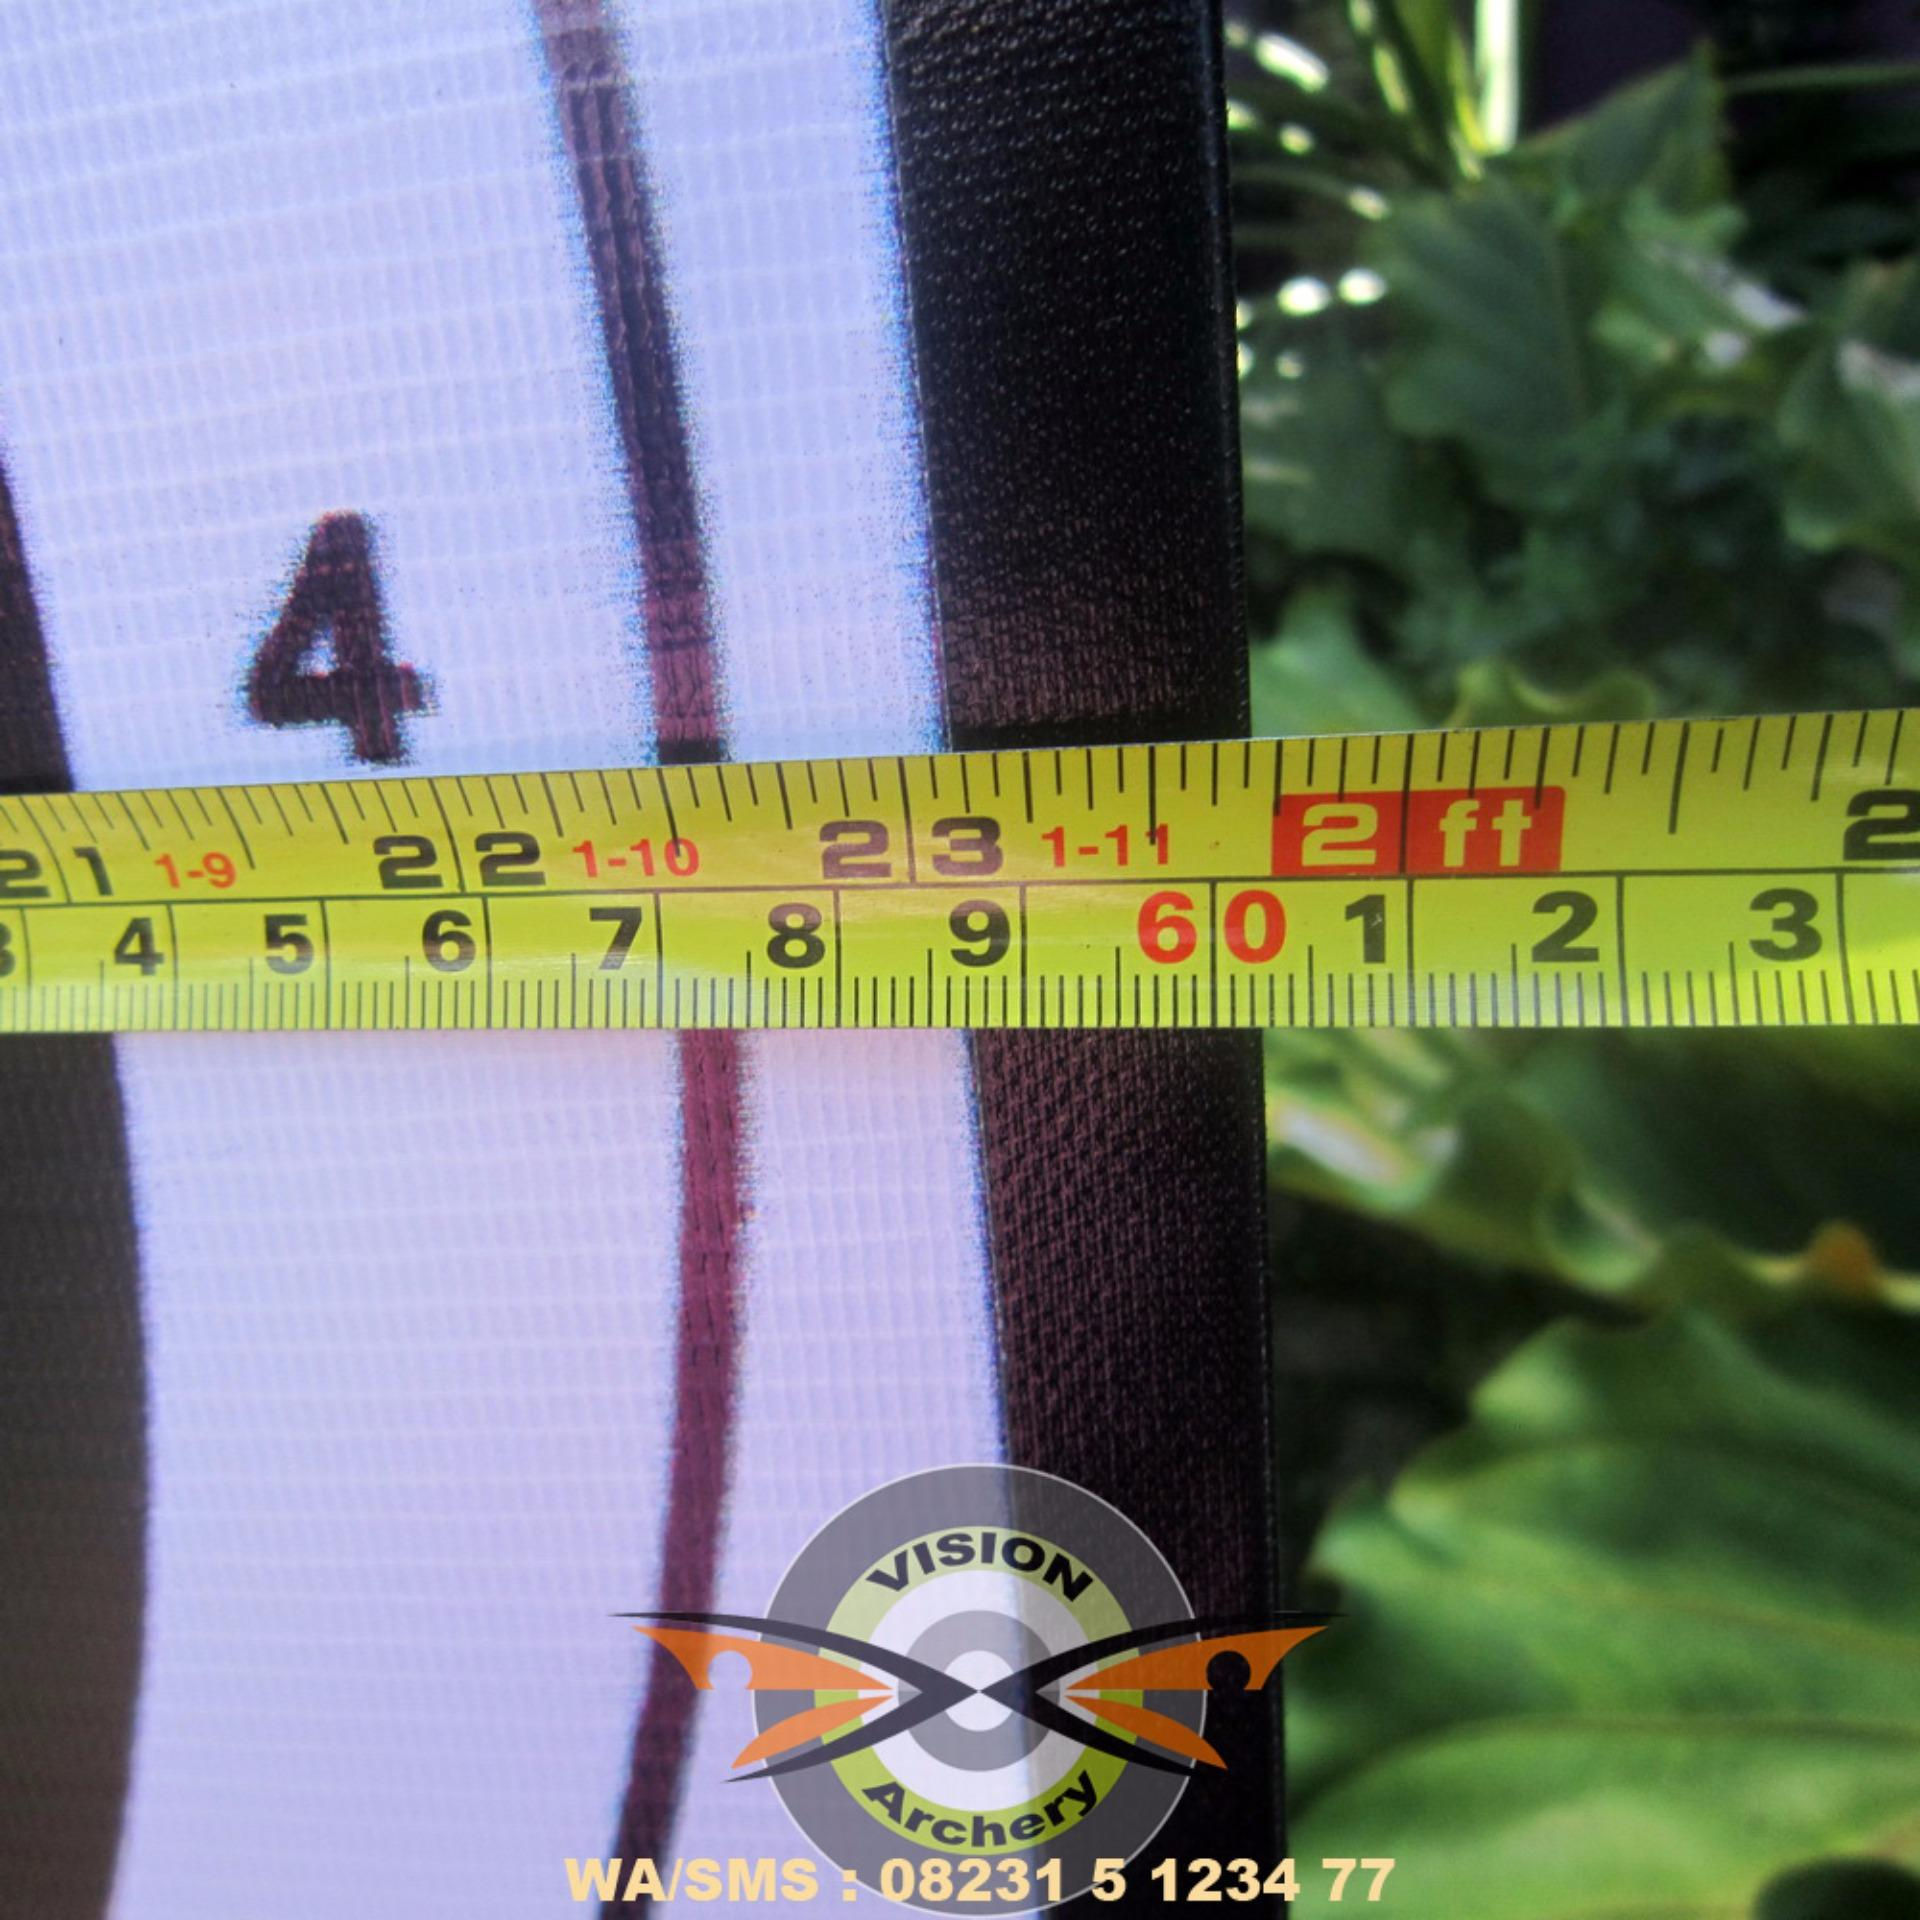 Belanja Murah Bantalan Face Target 60x60x5cm Bergaransi Bantal Panahan Karet Sasaran Arrow Busur Anak Panah